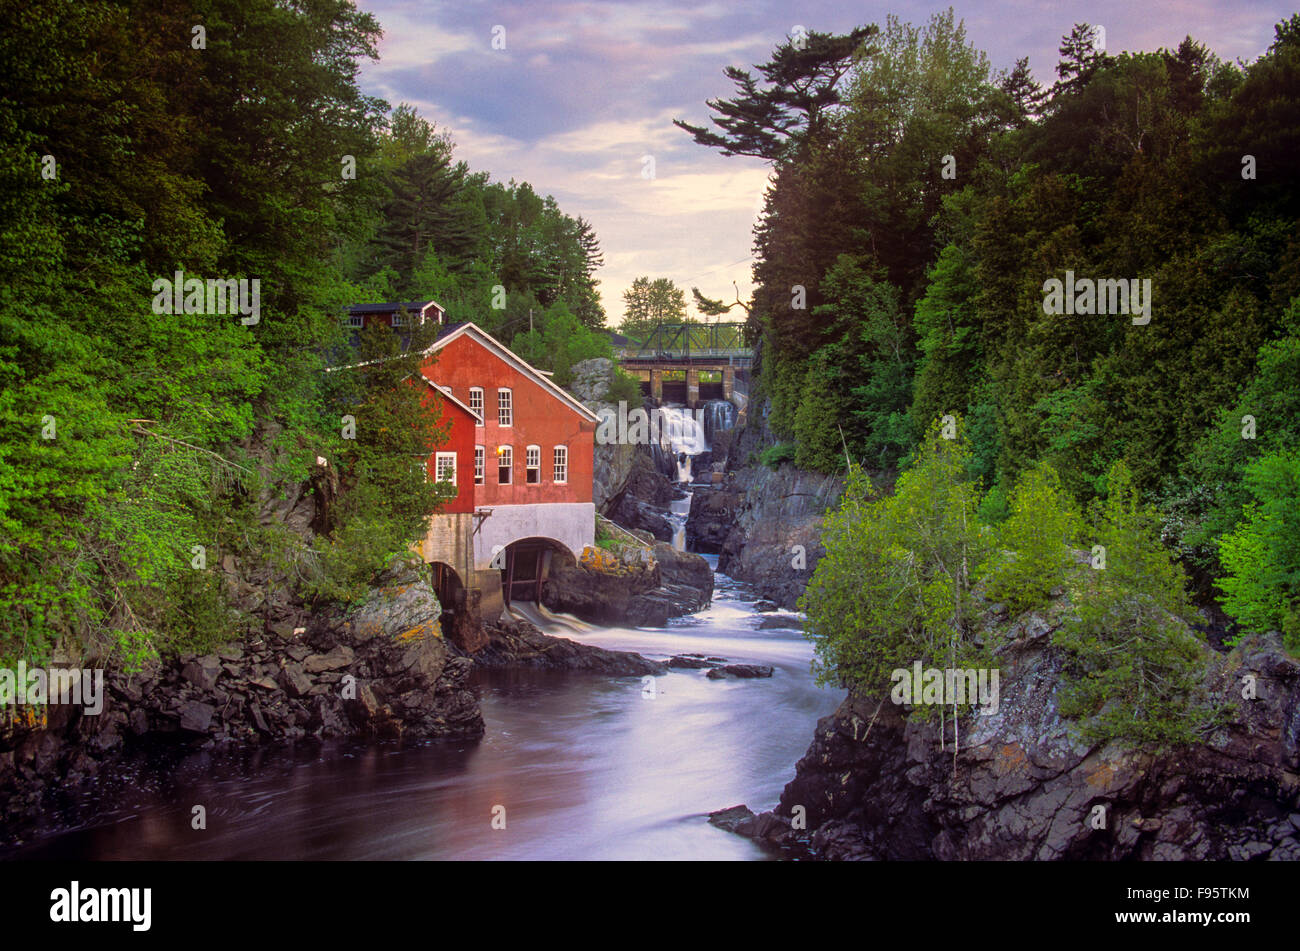 St. George, New Brunswick, Canada - Stock Image